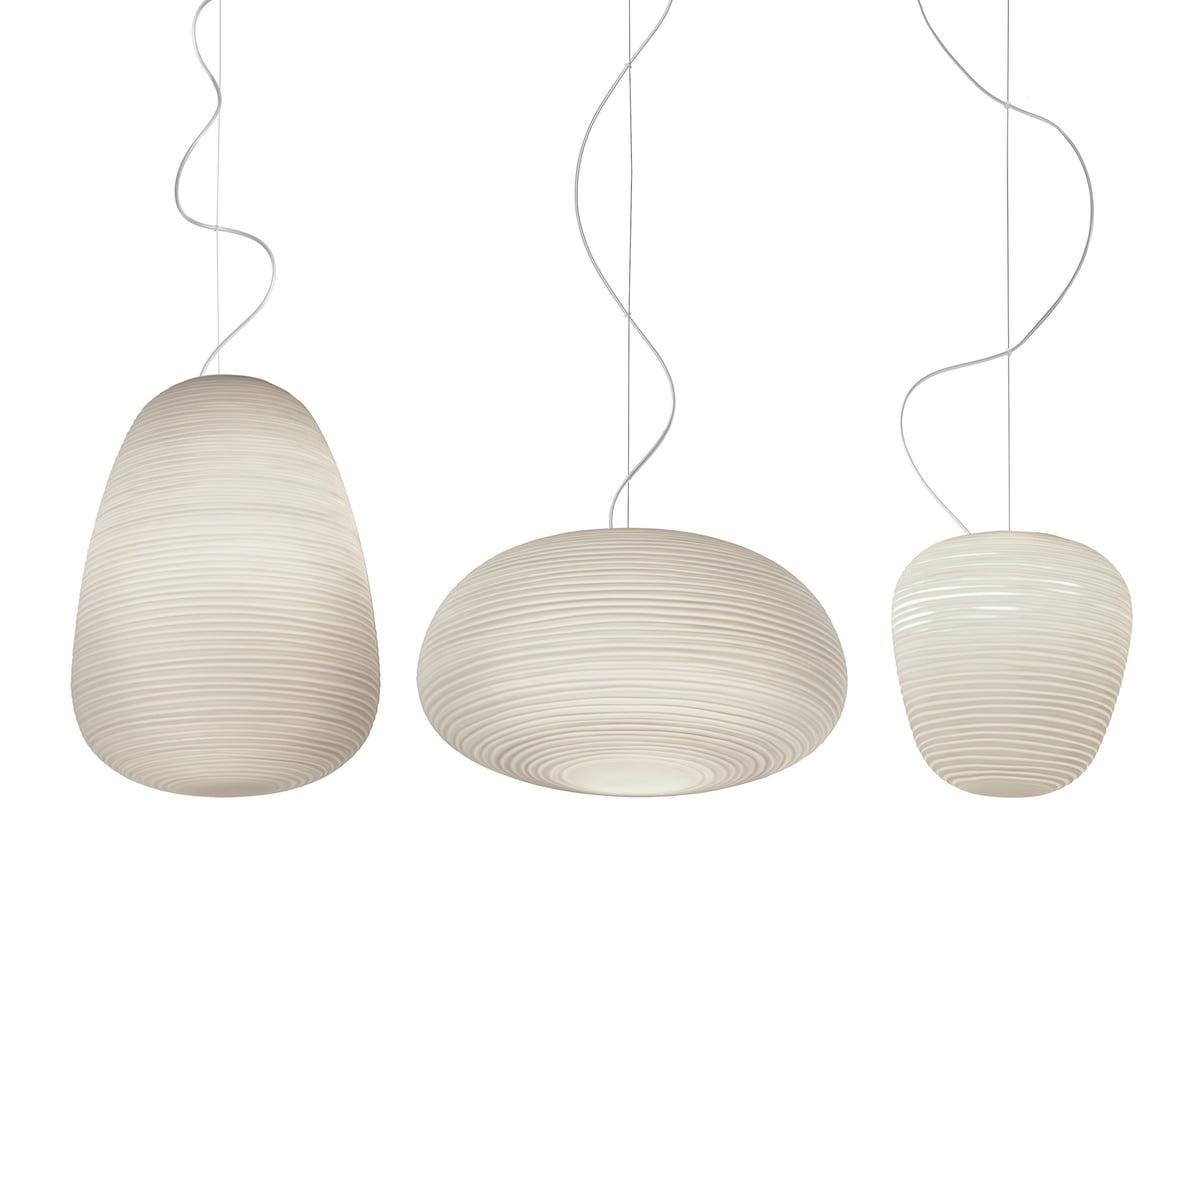 Rituals pendant lamp by foscarini in the shop foscarini rituals pendant lamps aloadofball Images